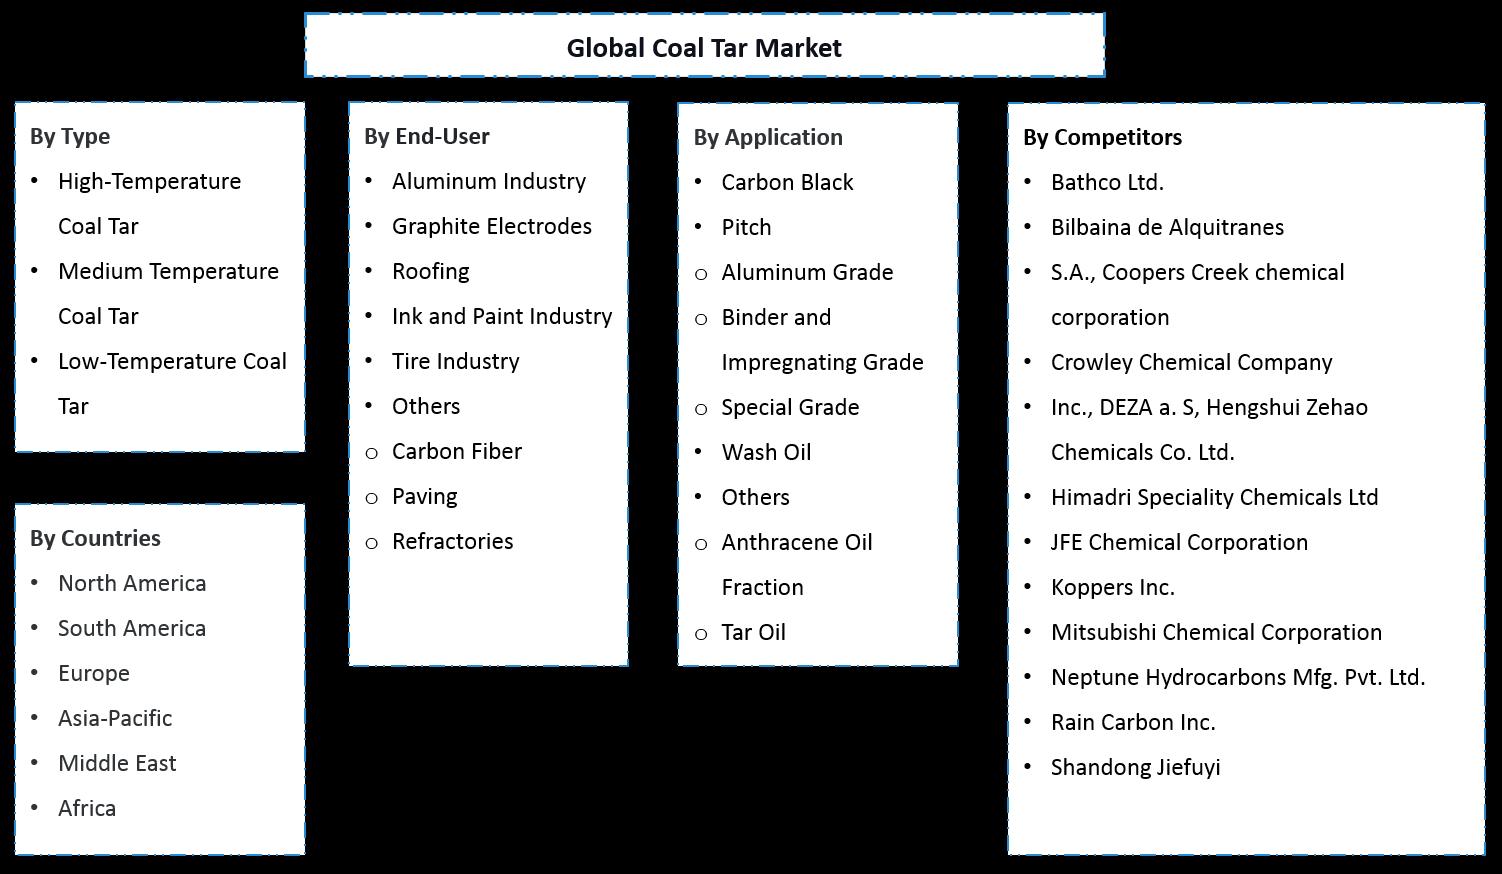 Global Coal Tar Market Segmentation